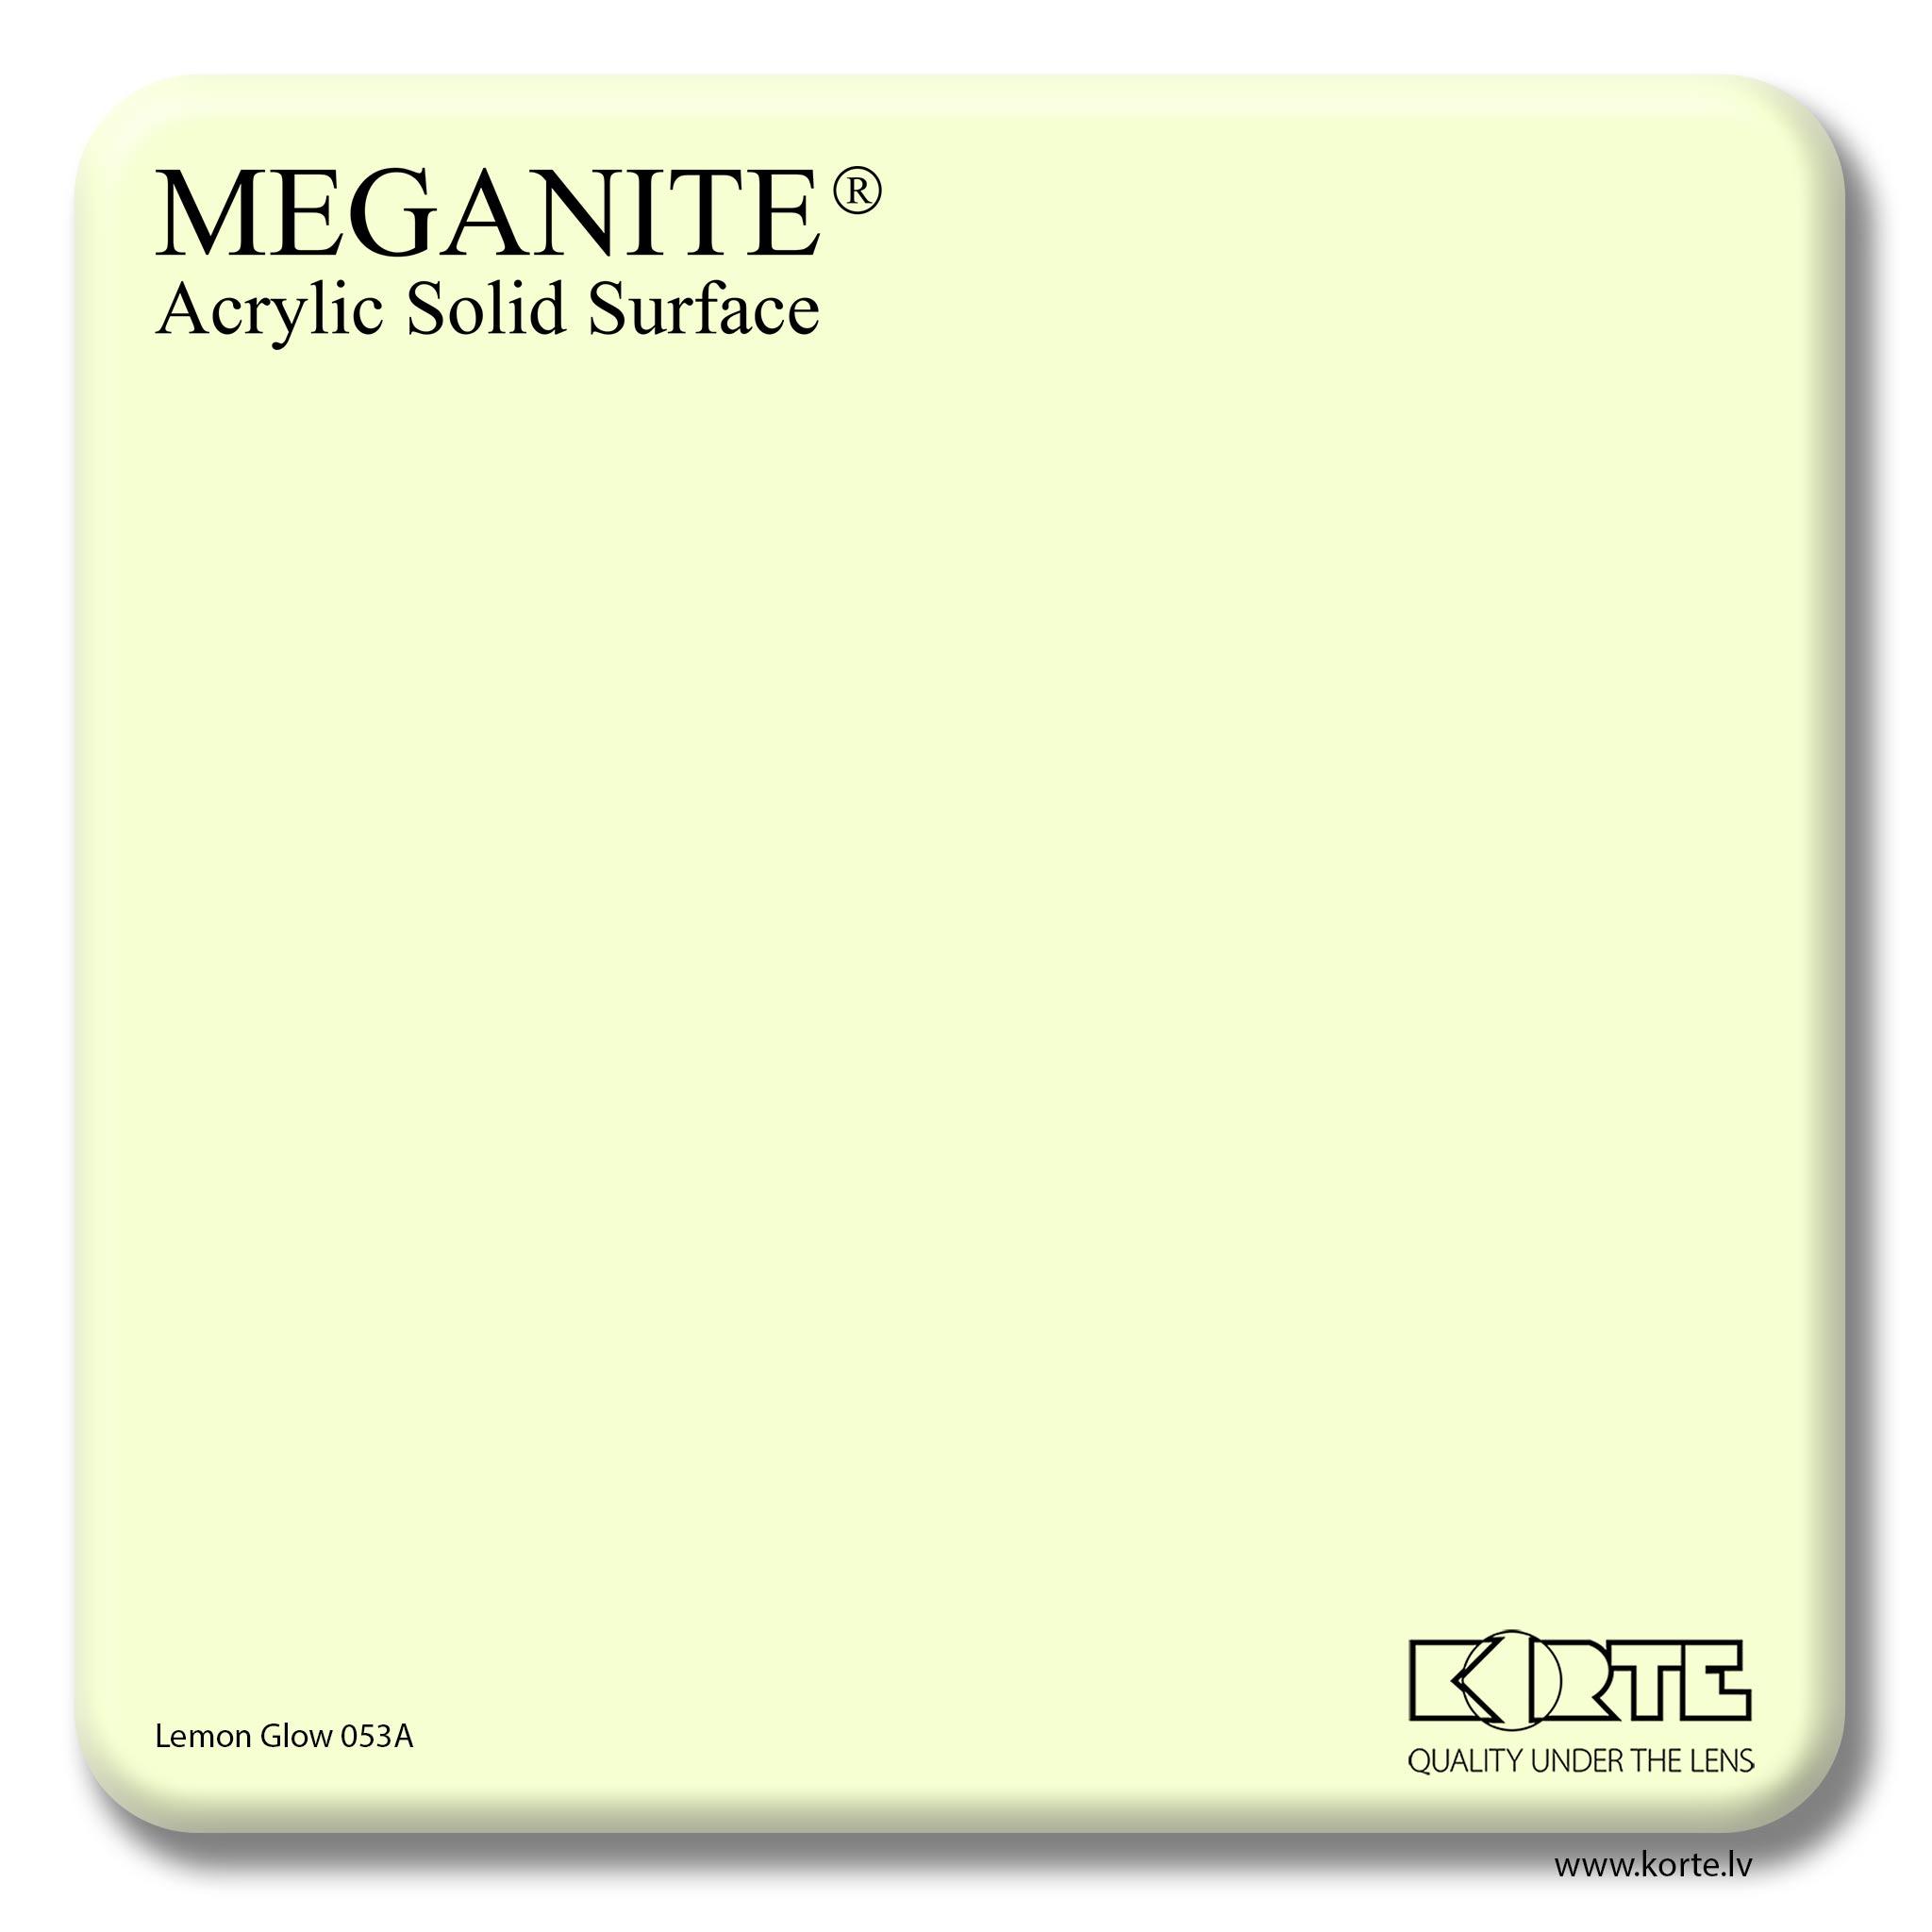 Meganite Lemon Glow 053A